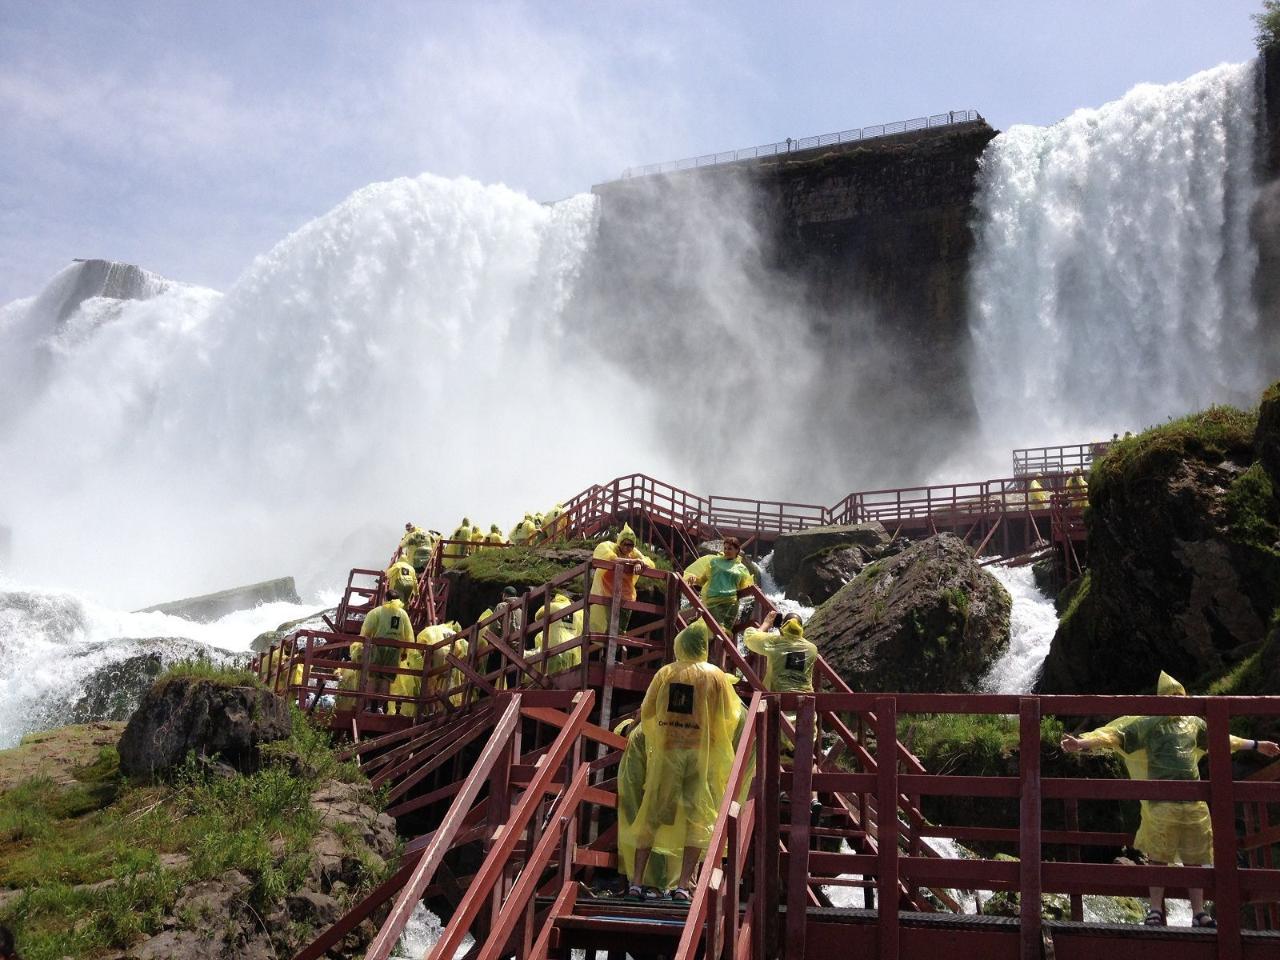 Maid in America Tour (U.S.A side of Niagara Falls)